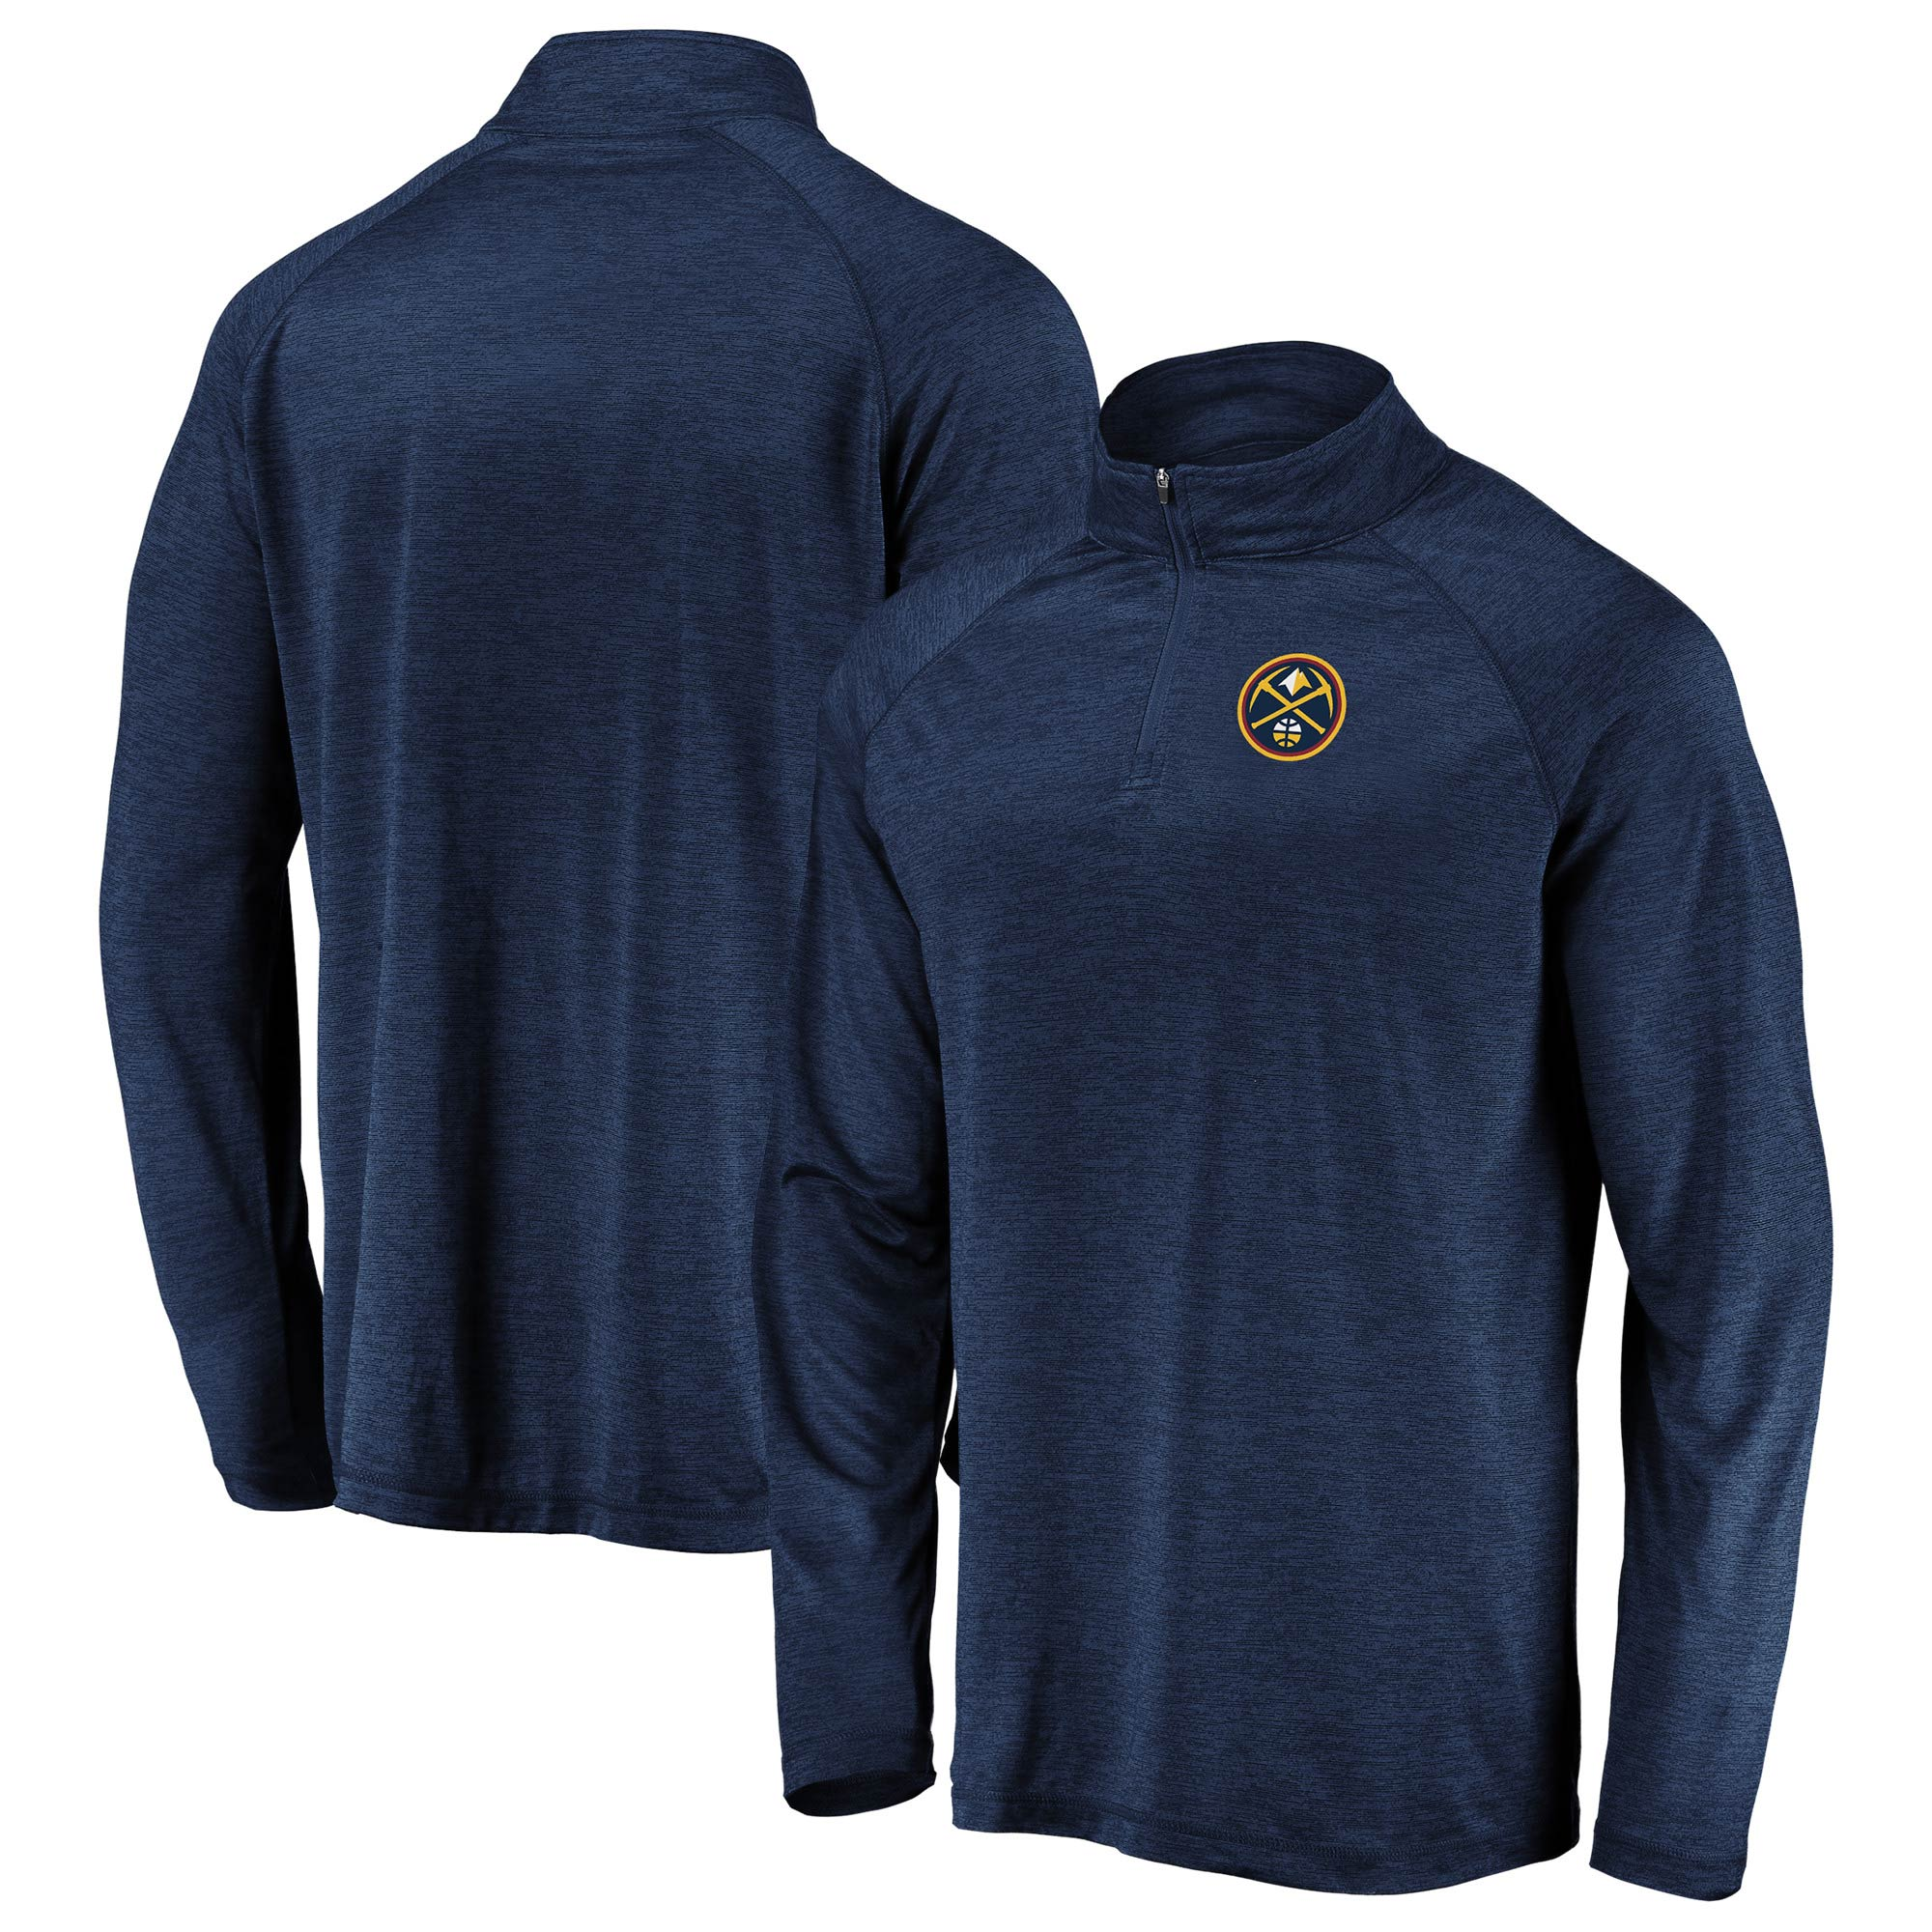 Denver Nuggets Fanatics Branded Iconic Striated Raglan Quarter-Zip Pullover Jacket - Navy